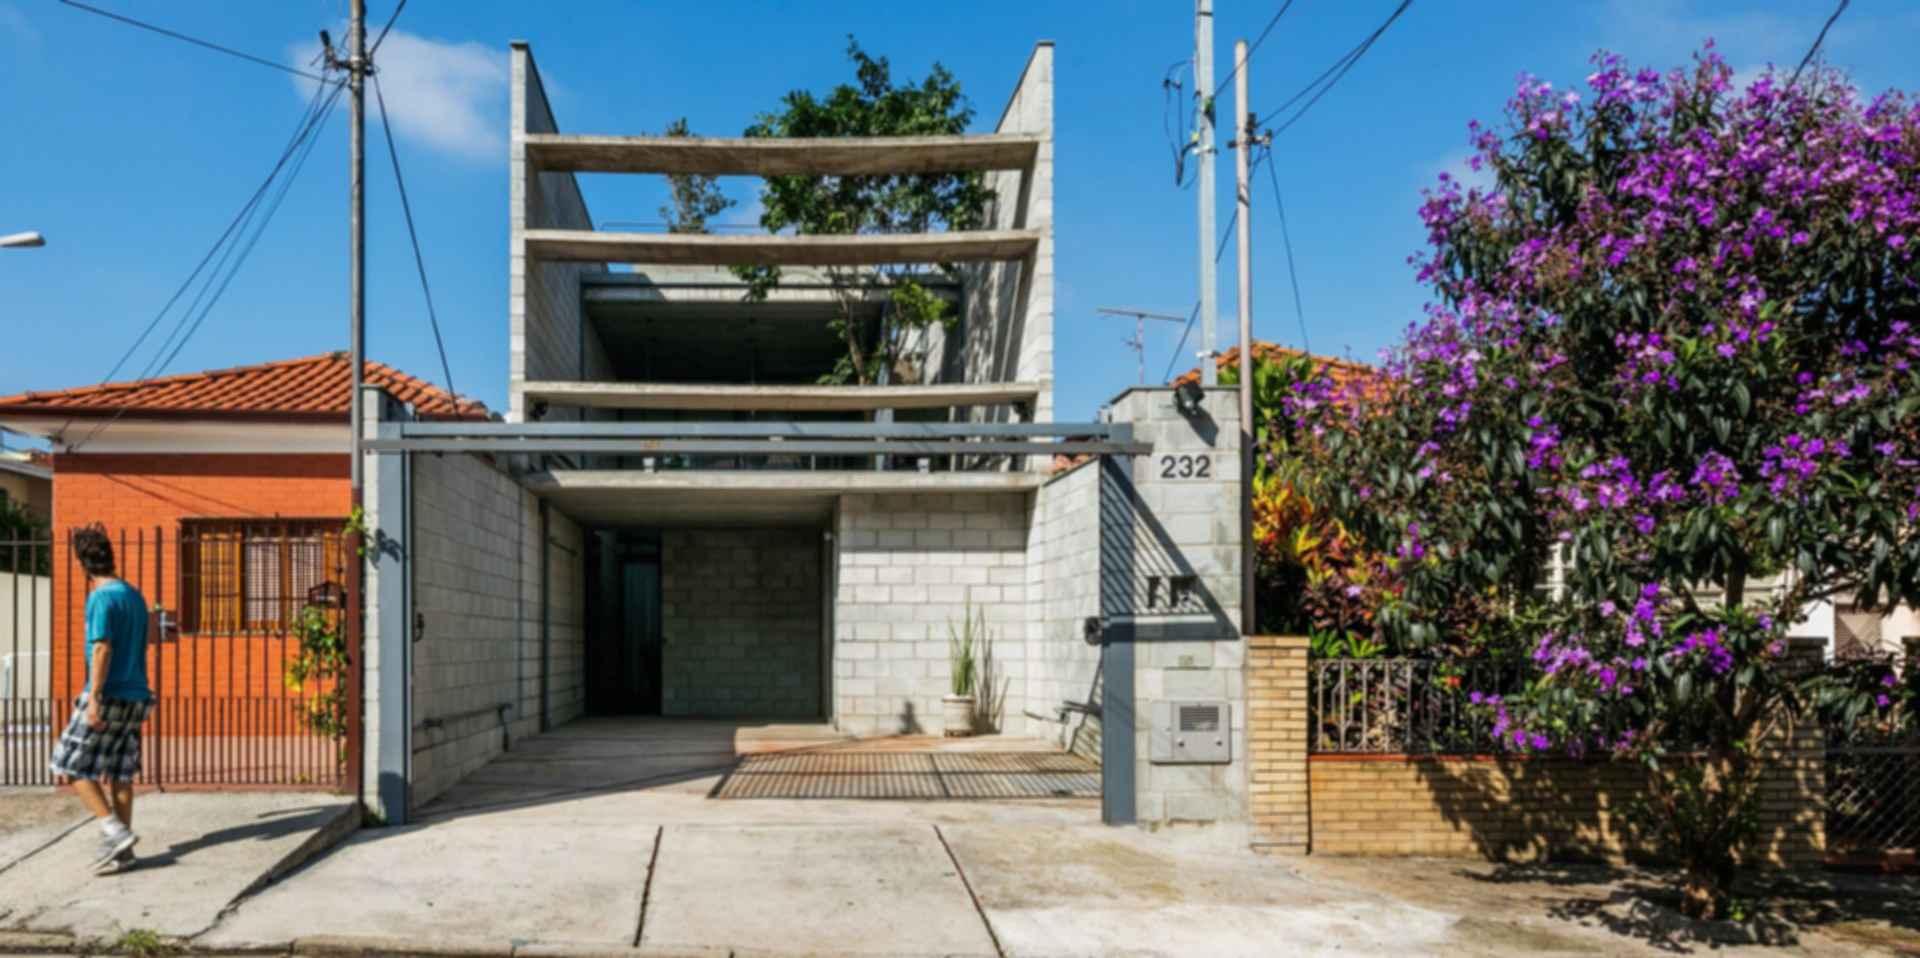 Mipibu House - Exterior/Street View